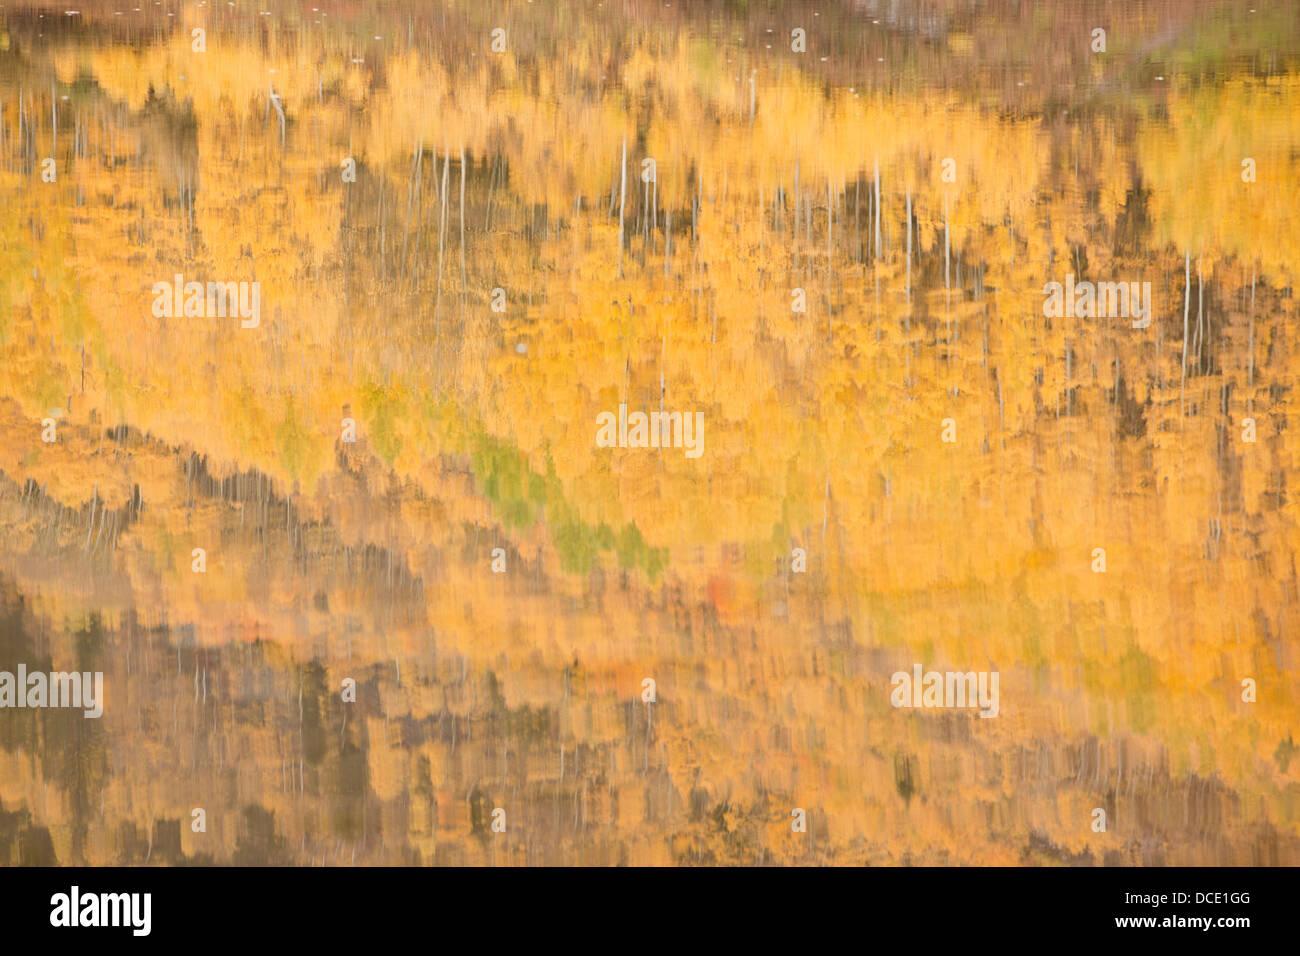 USA, Colorado, Aspen. Aspen trees reflected in Maroon Lake. - Stock Image